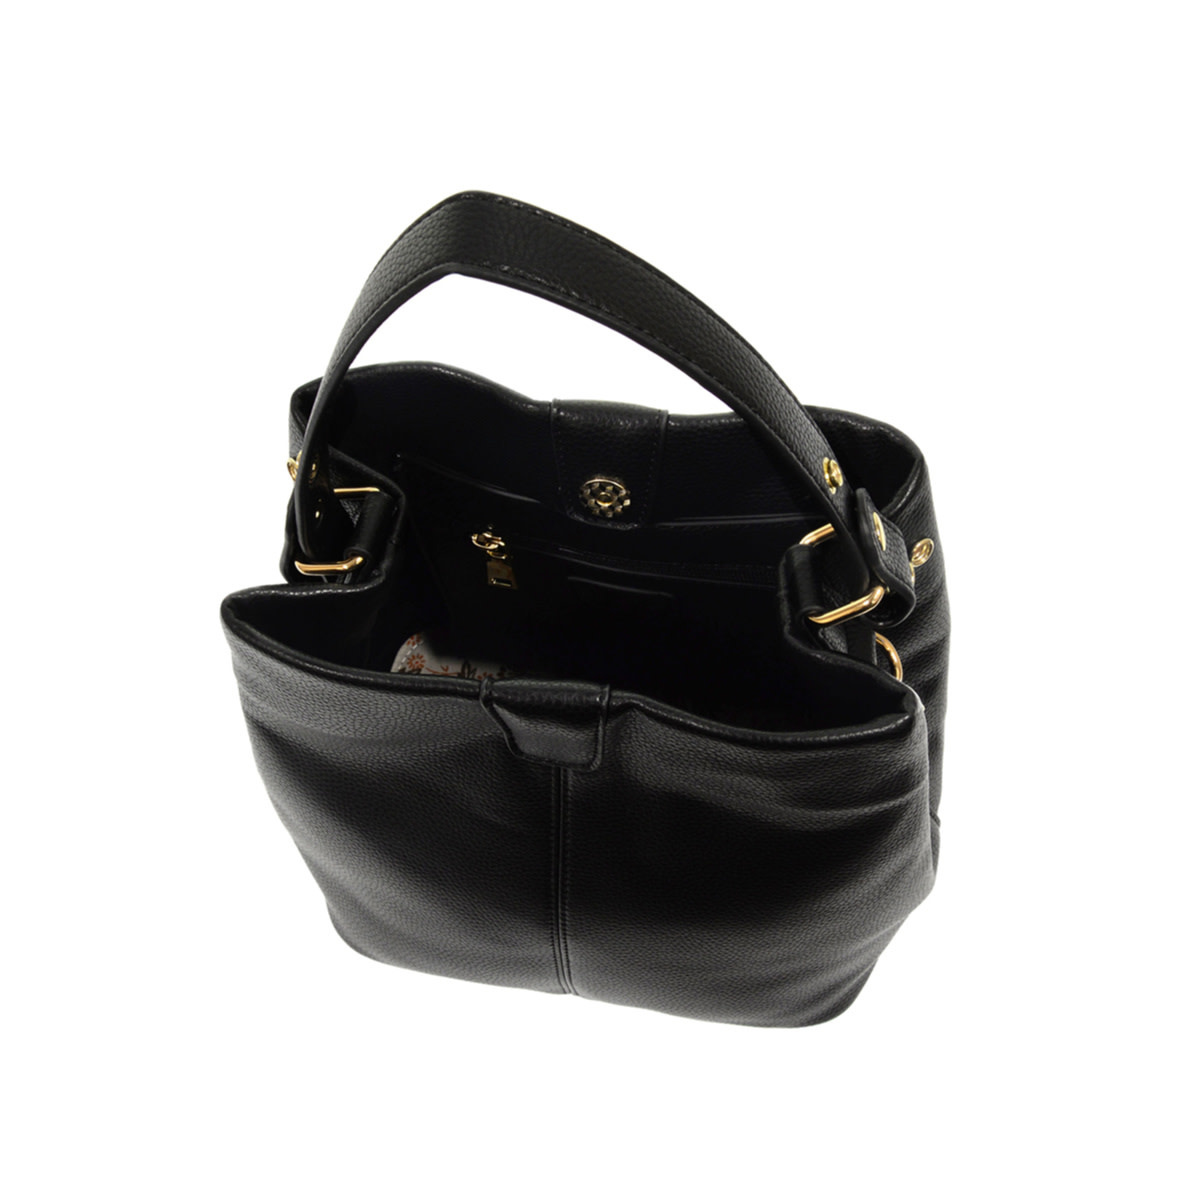 Joy Susan Joy Susan Ava Shoulder Bag Black